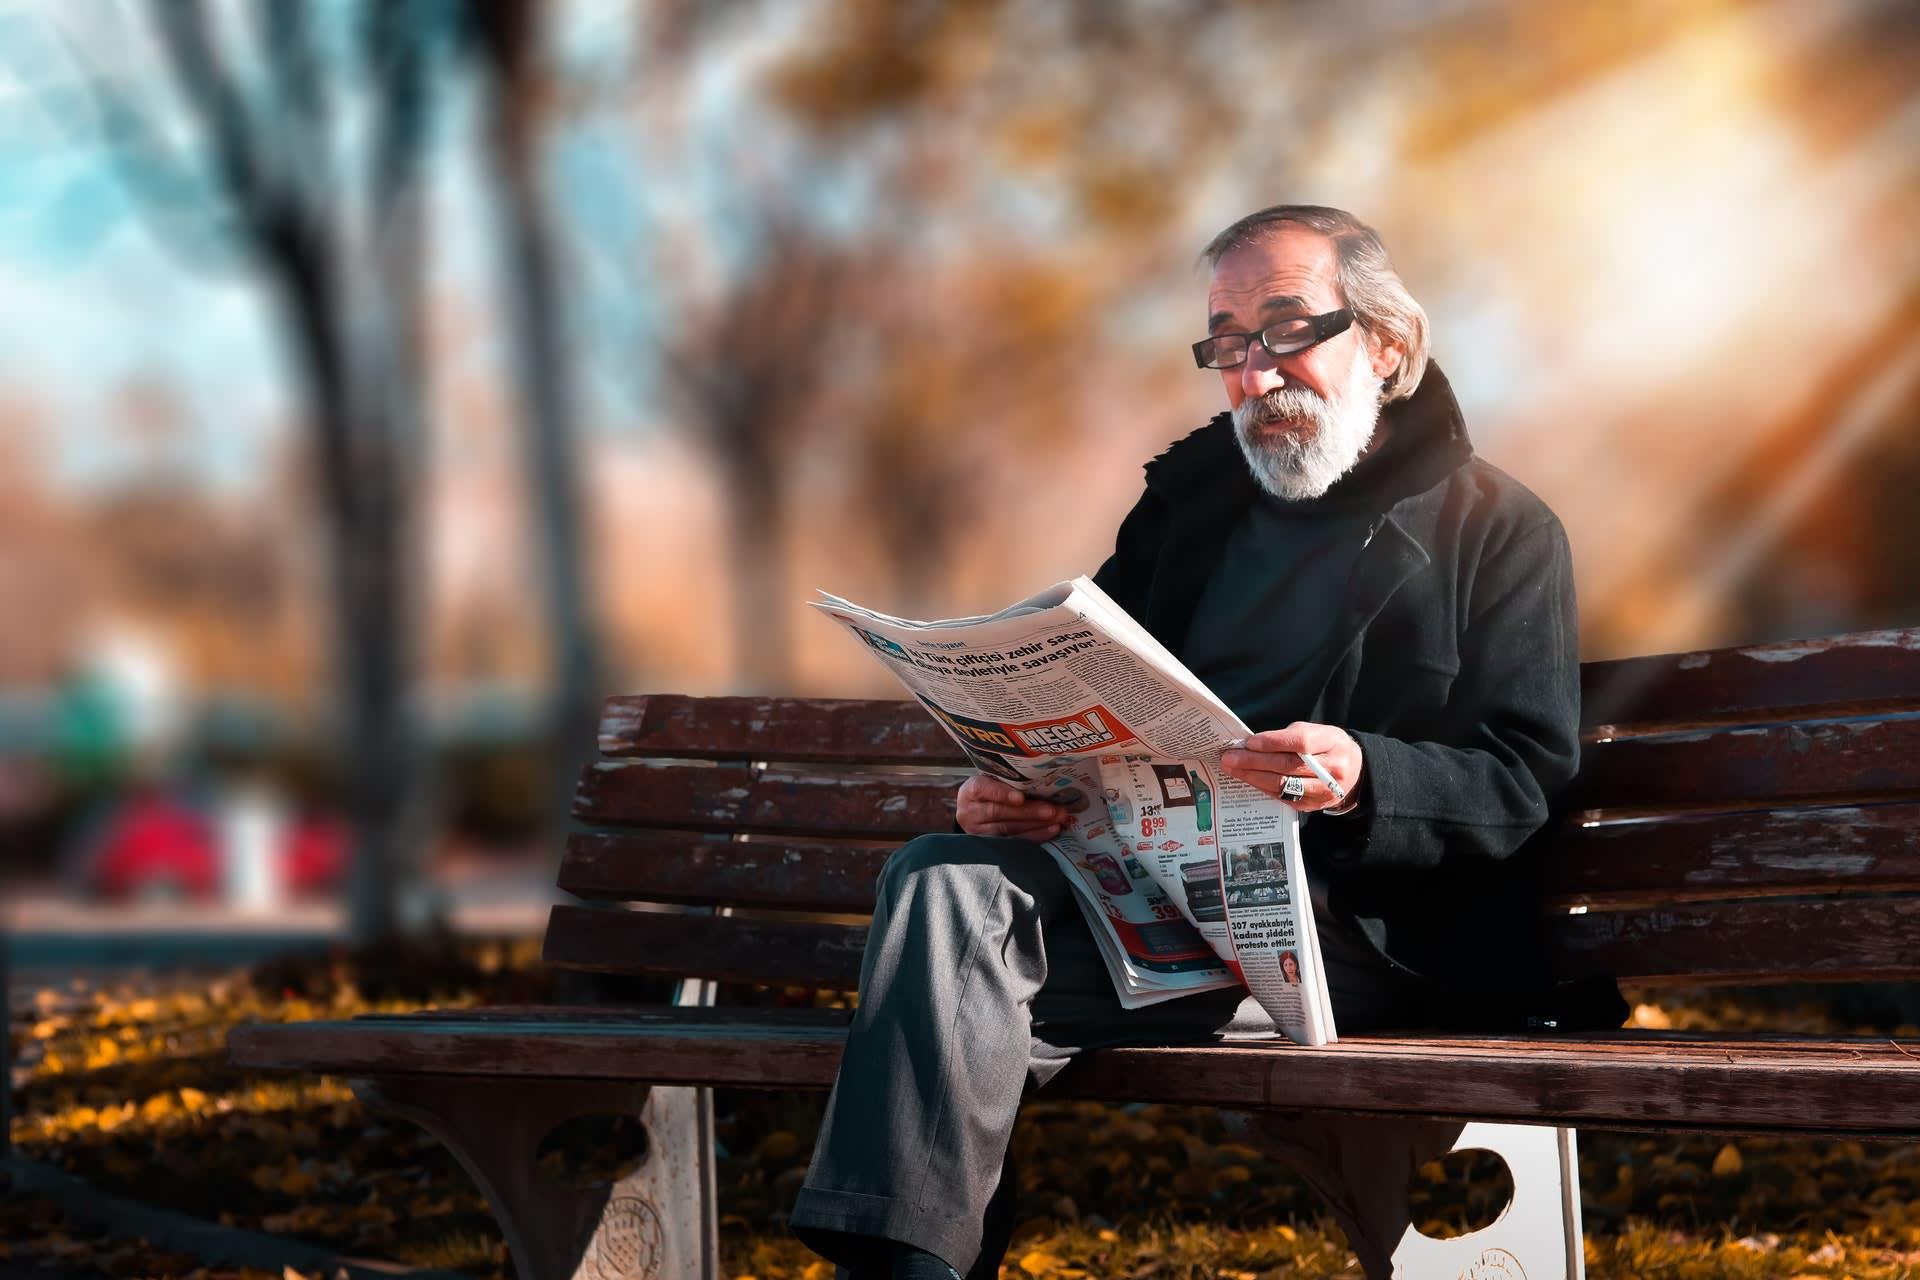 Pension savers caught between falls and fraud